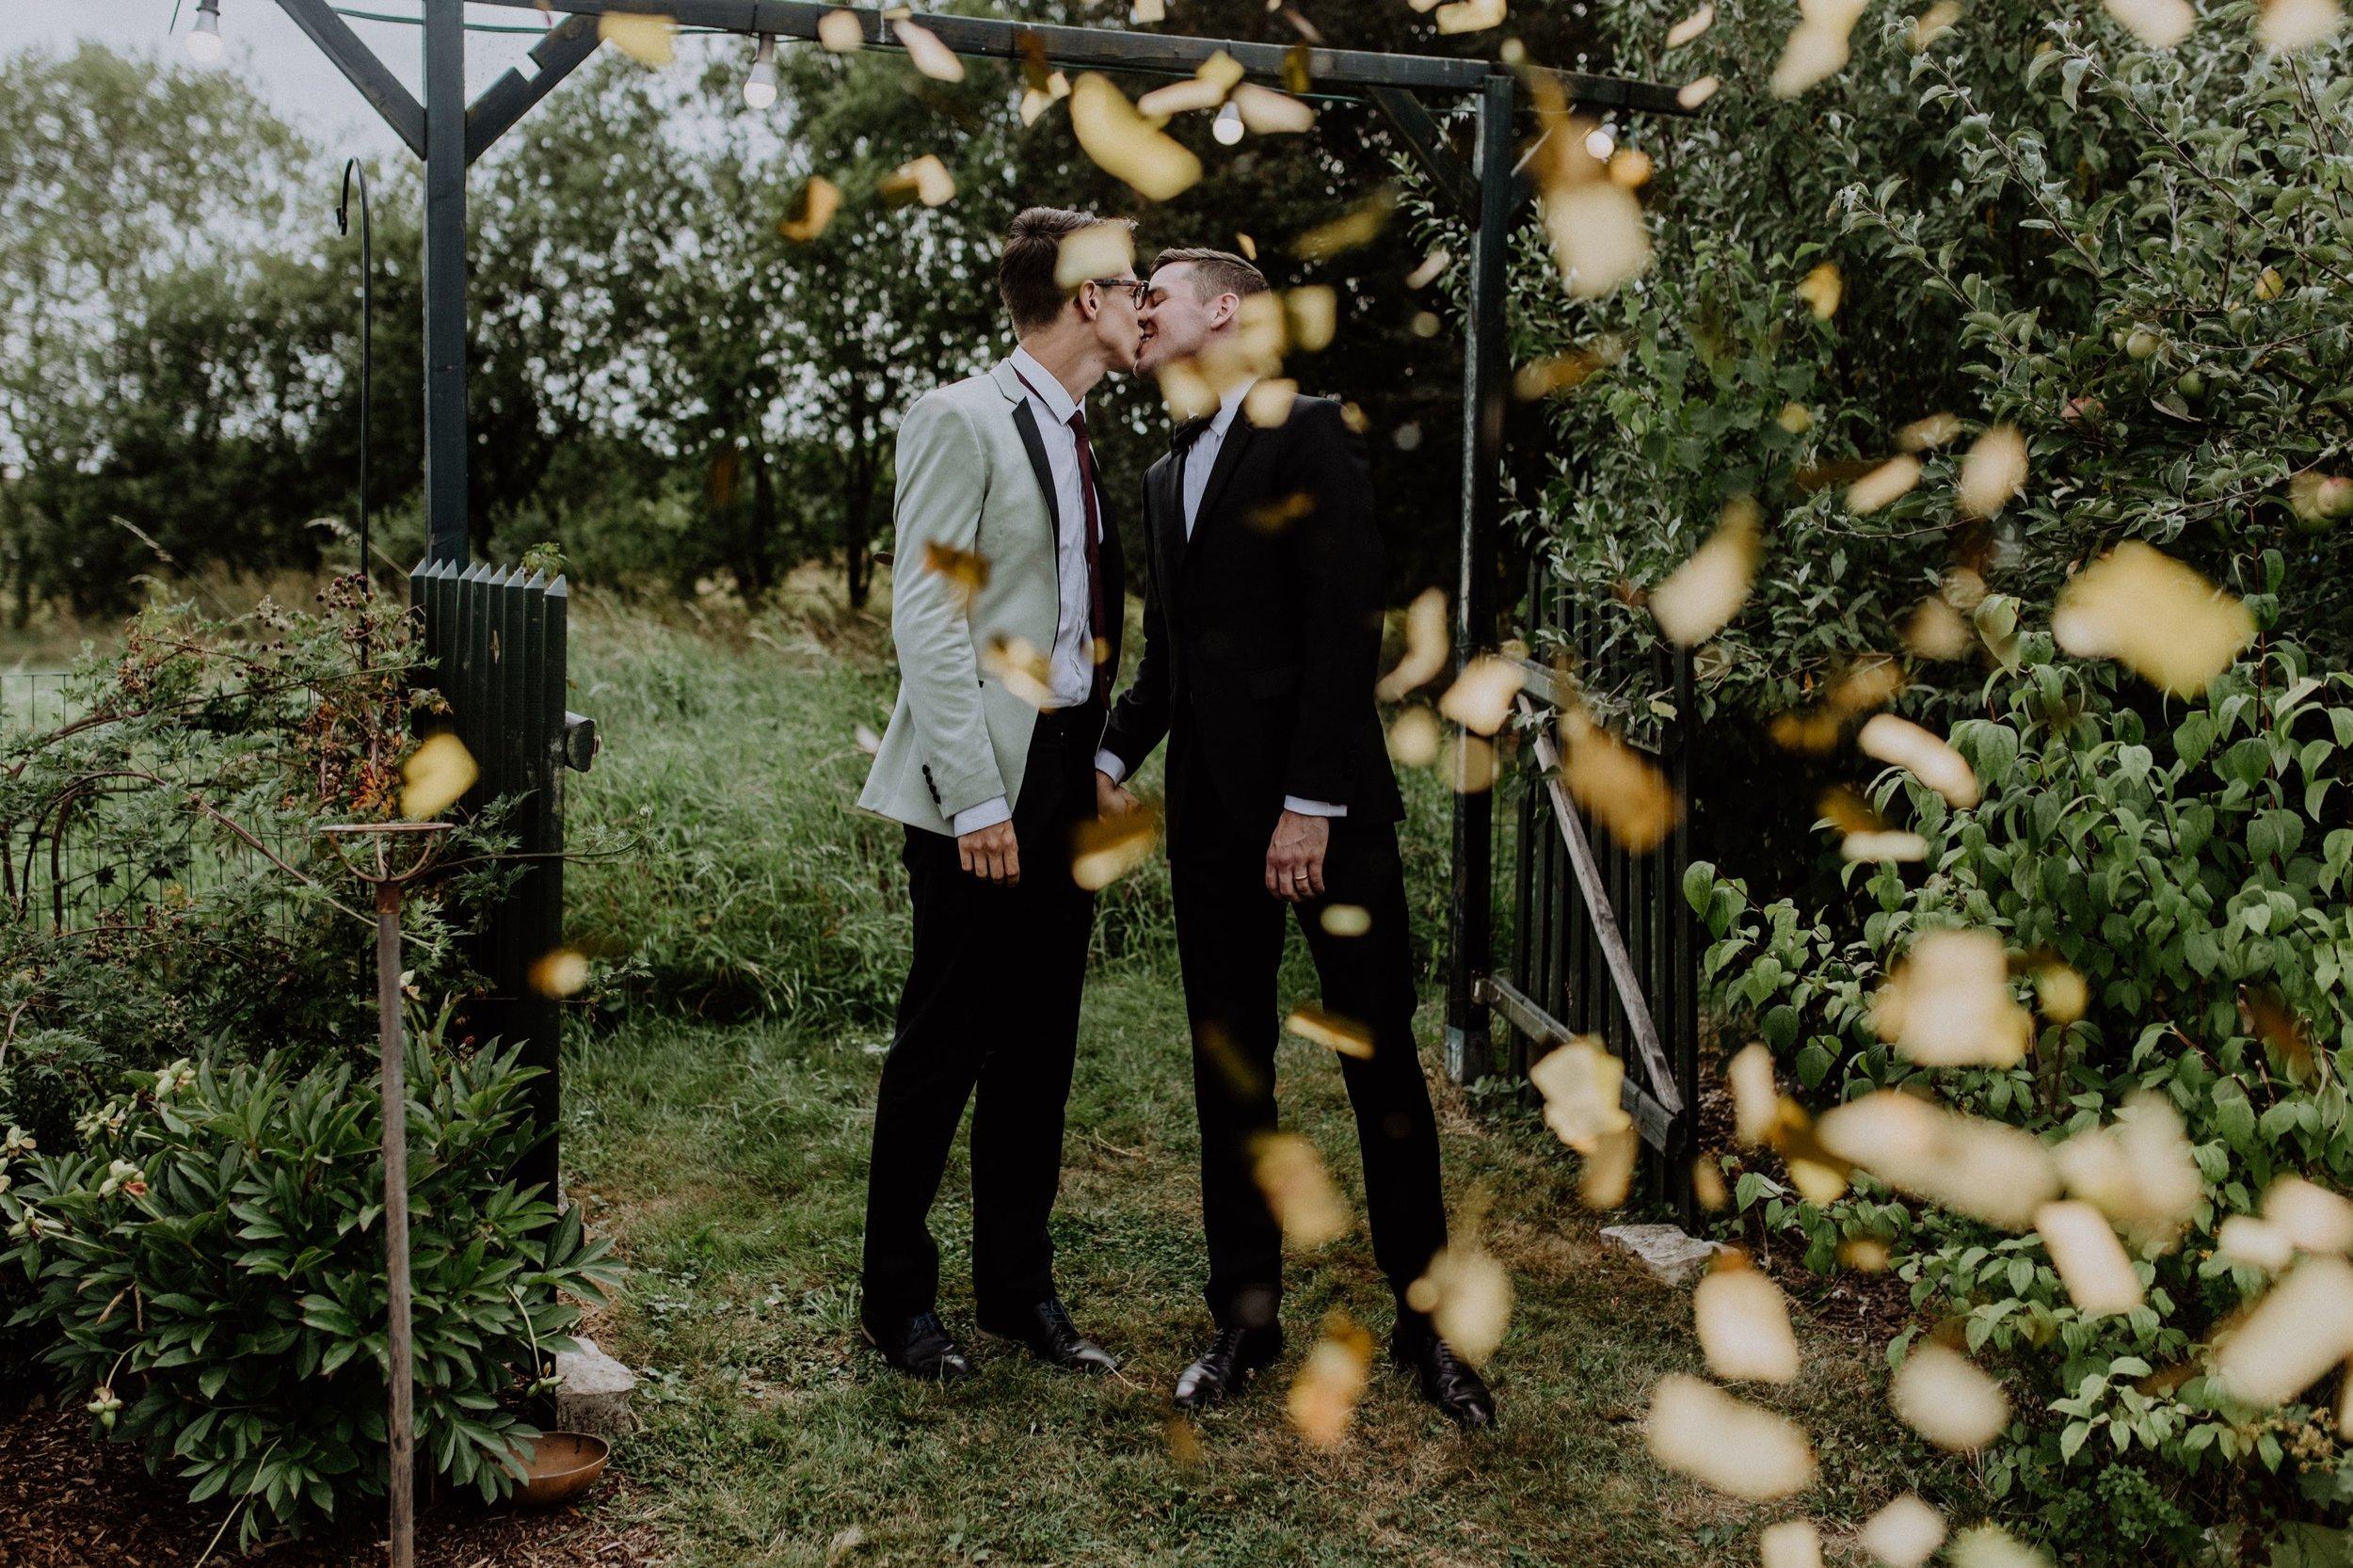 mr theodore-same-sex wedding_melbourne wedding directory225.jpg